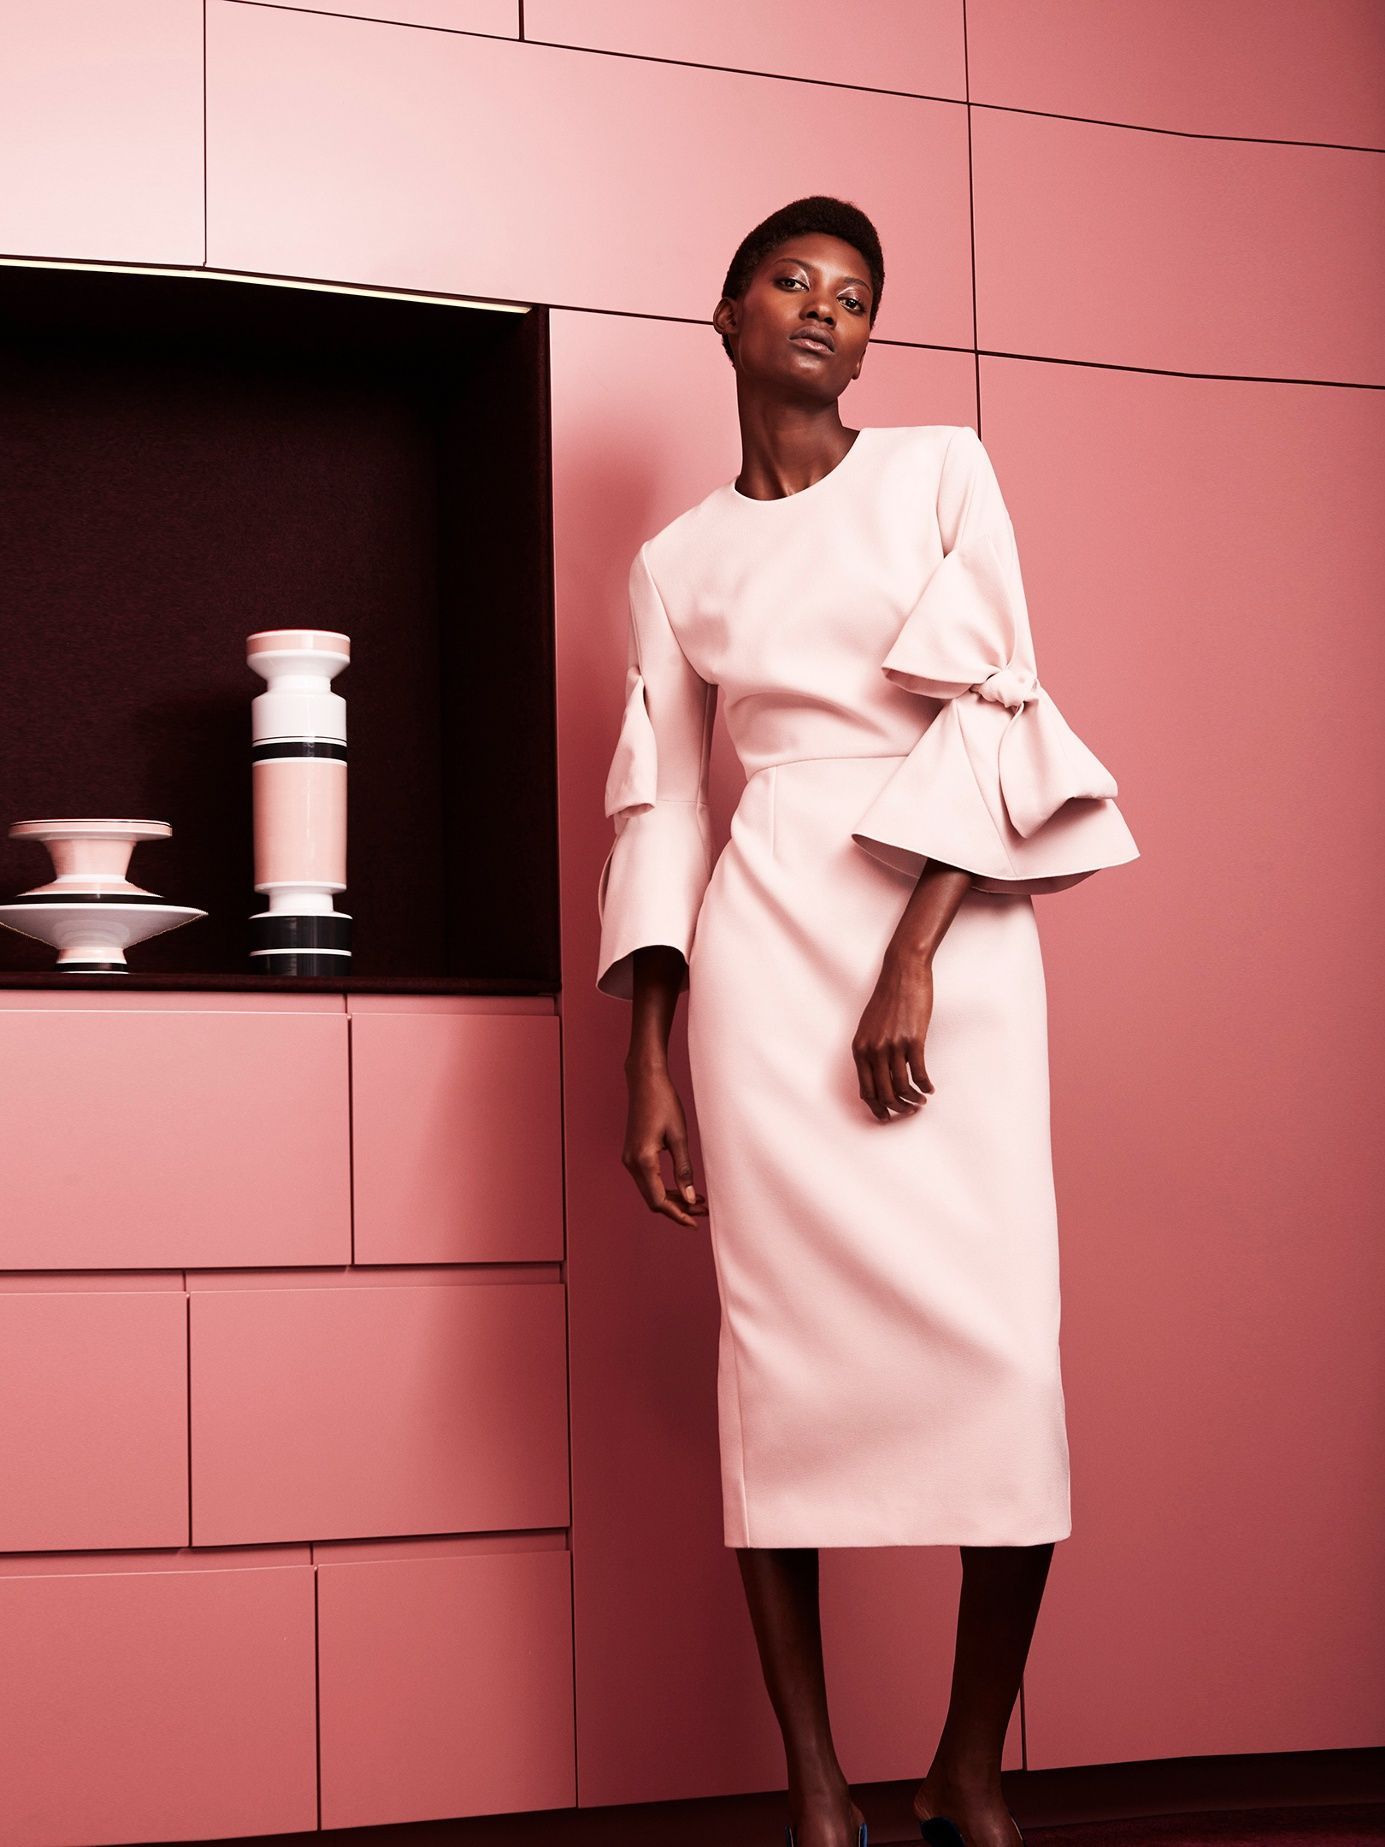 Pin by Chakinee Patchara anan on fashion 8 Pinterest